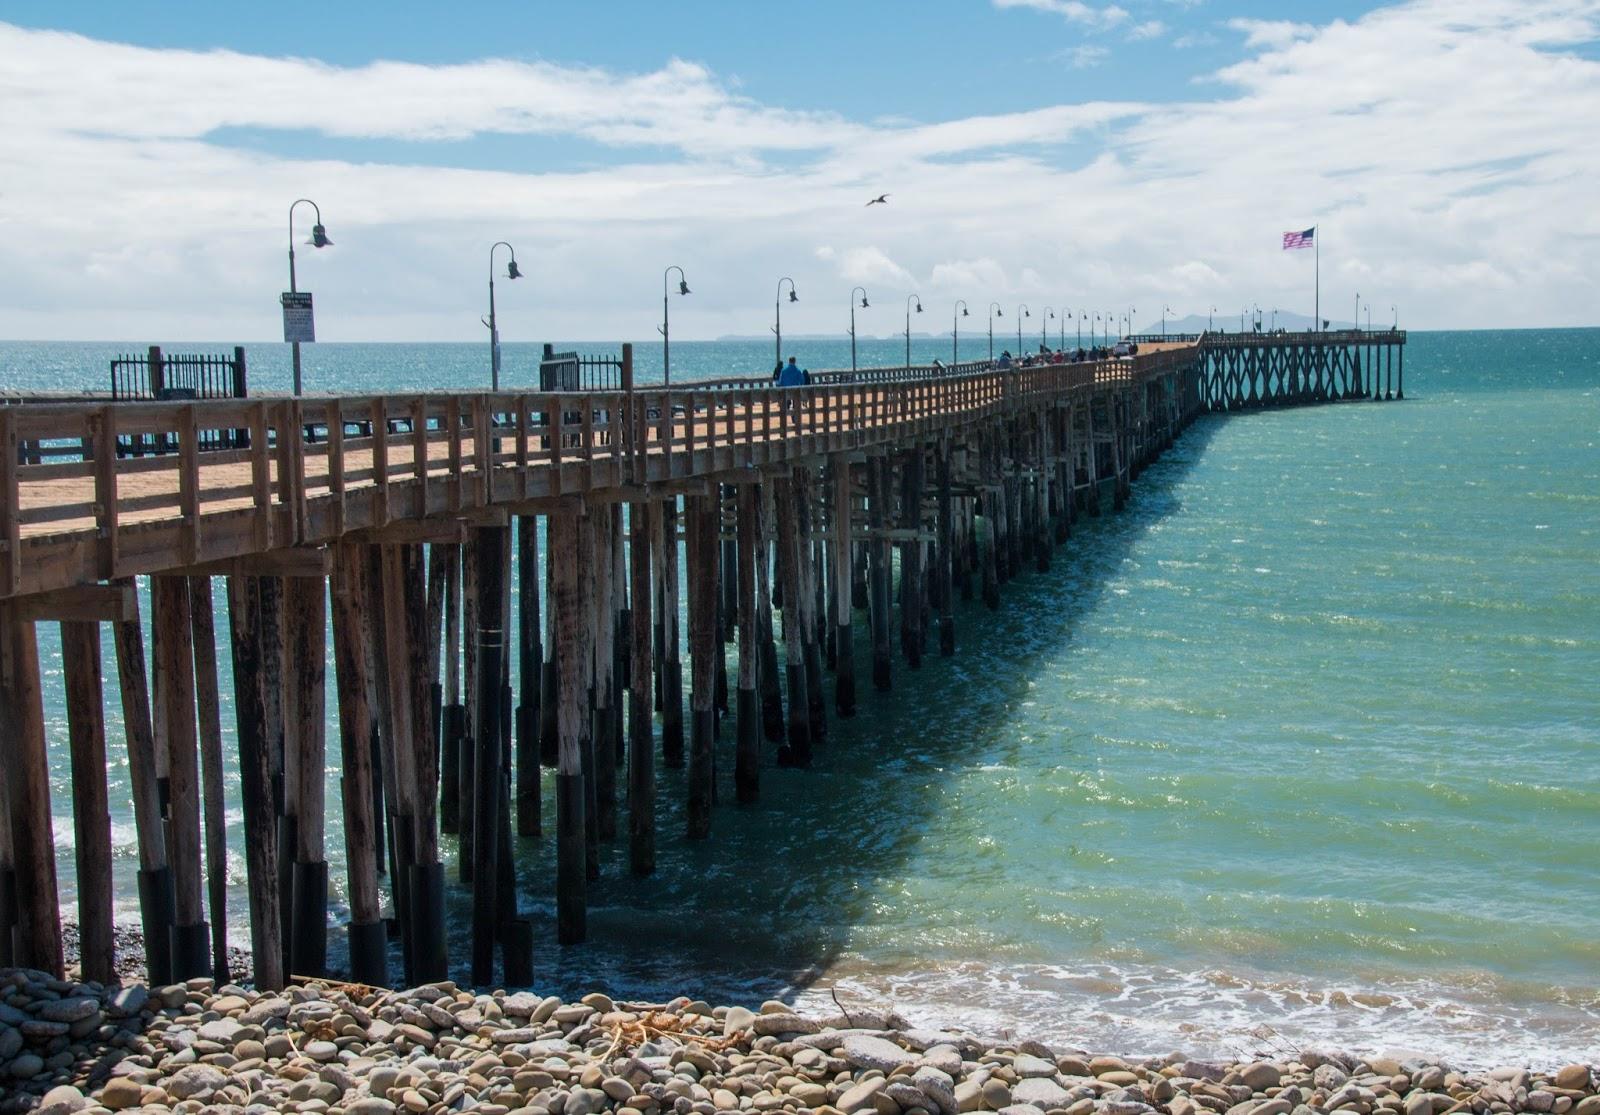 Kastle 39 s journey ventura and santa barbara california for Ventura pier fishing